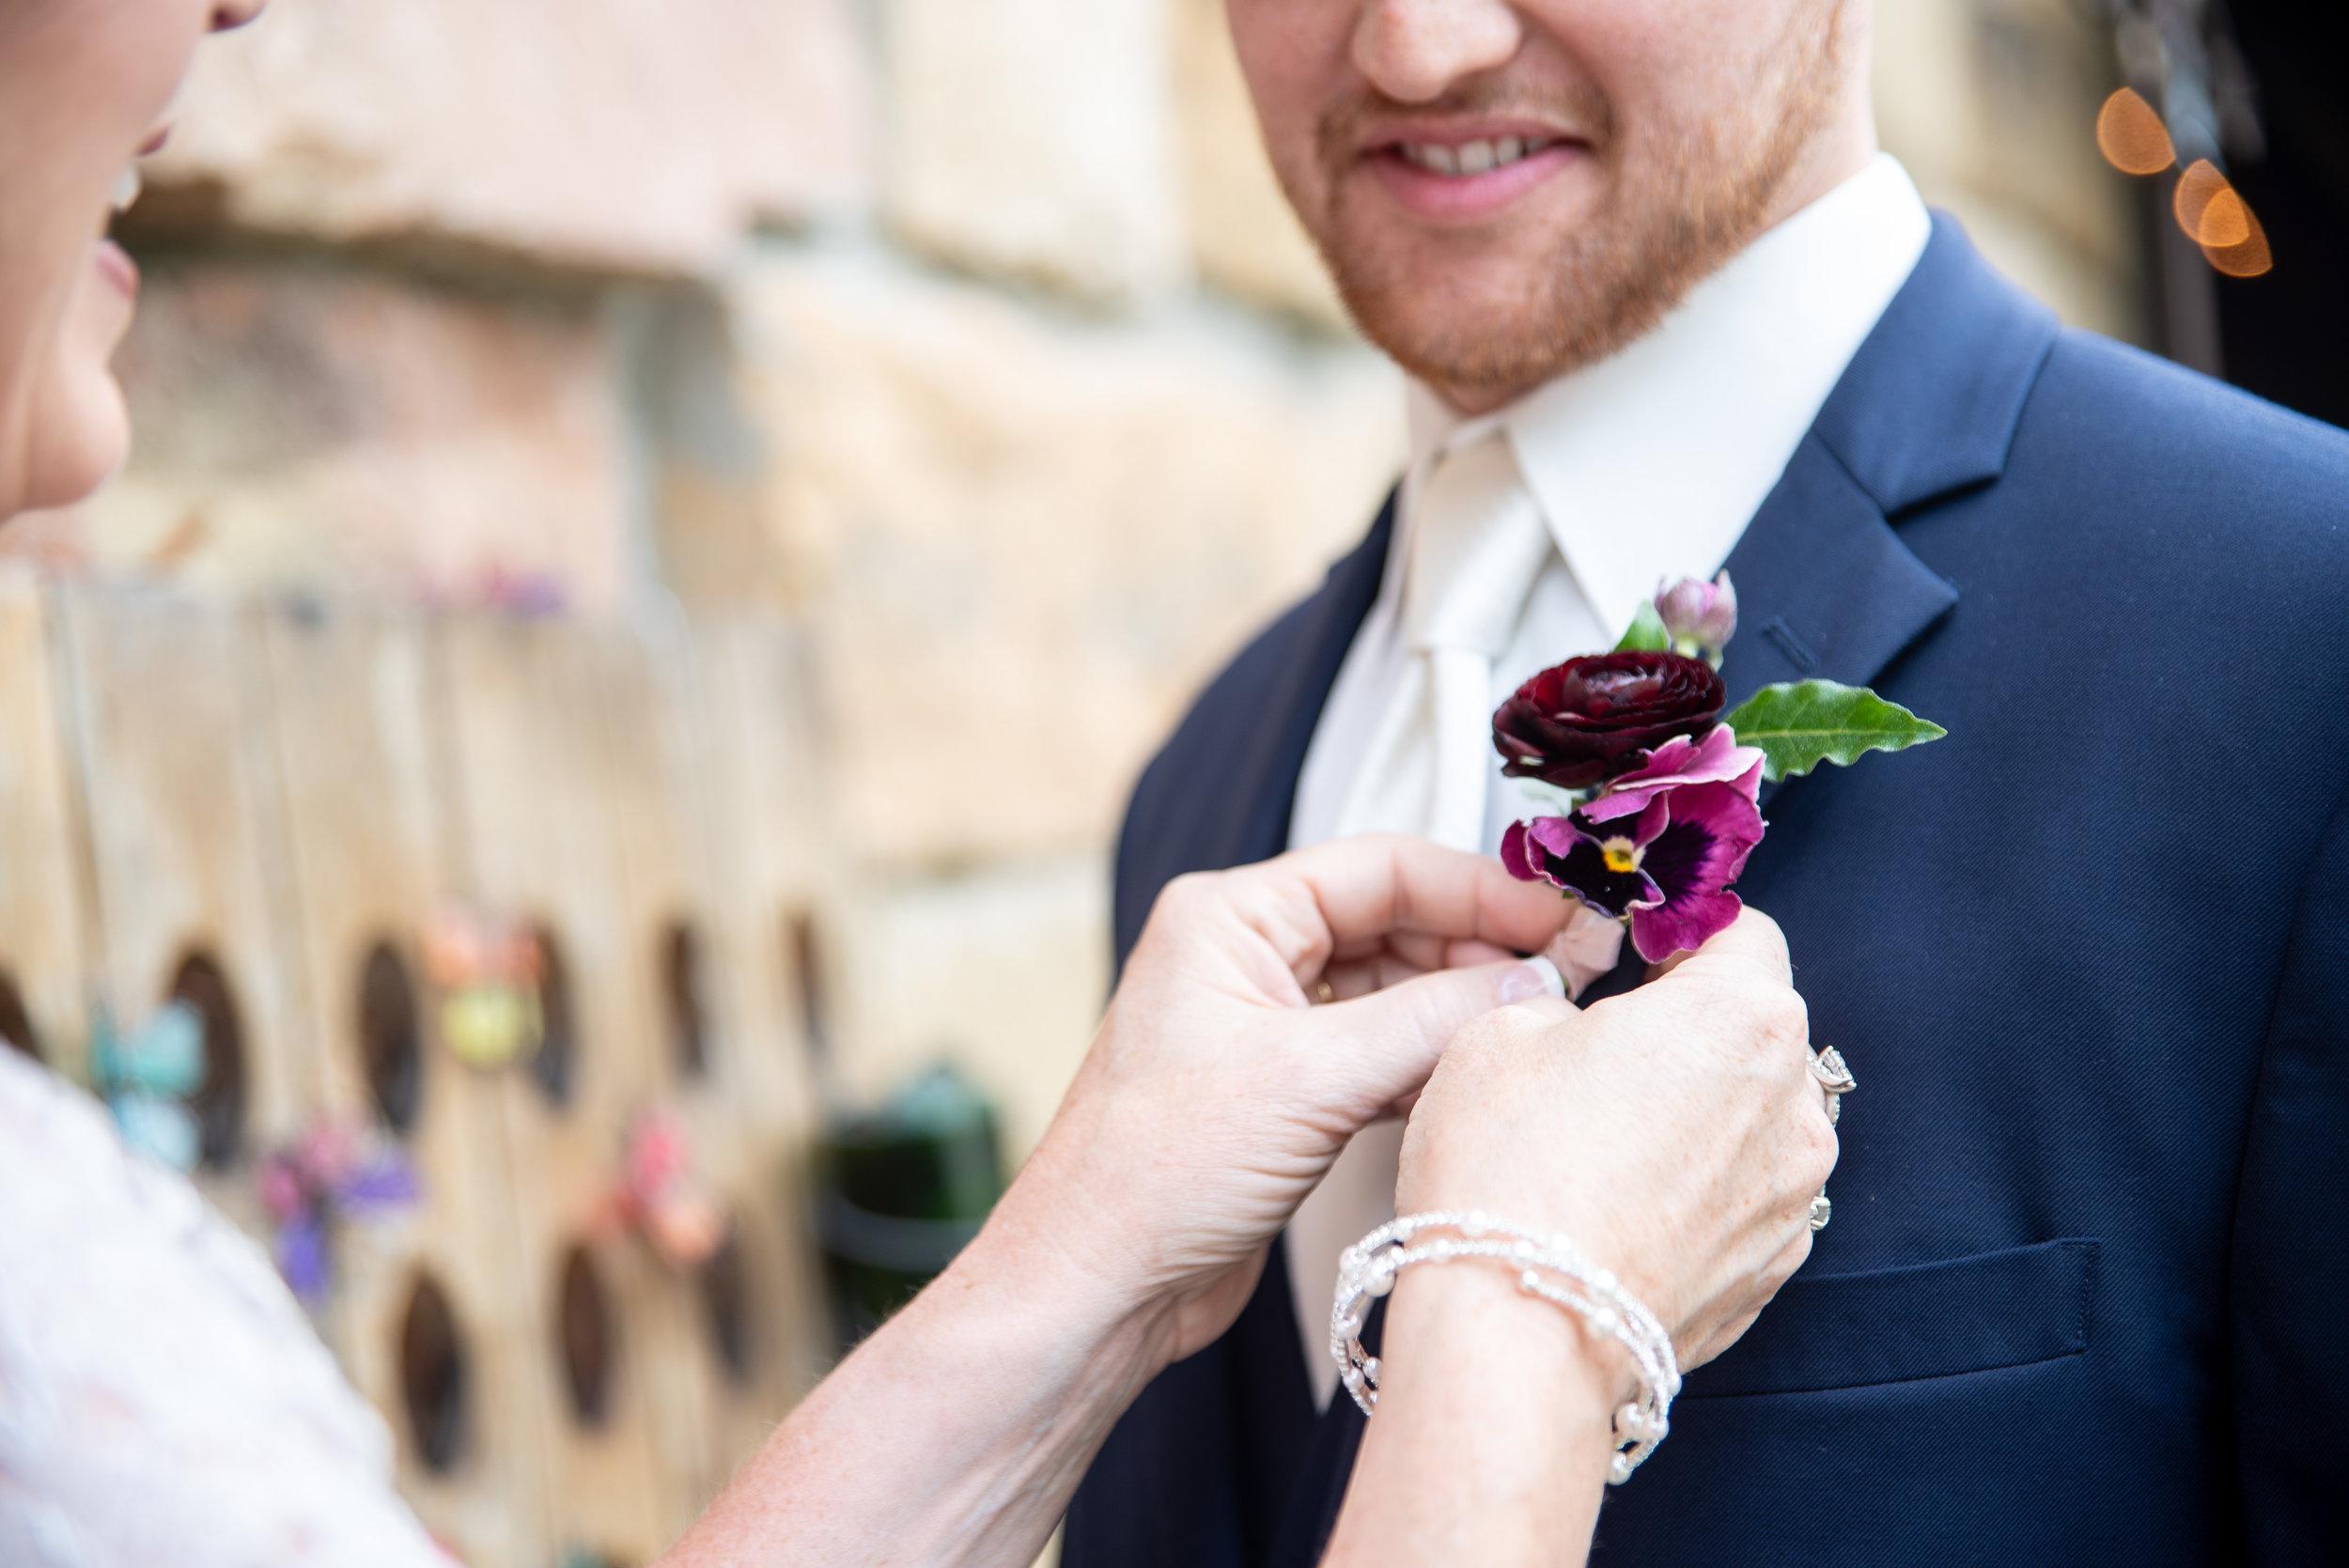 Wine Inspired Vintage Wedding | burgundy, fuchsia, deep wine jewel toned wedding flowers. Lush, natural, boutonniere |  Loveshyla.com